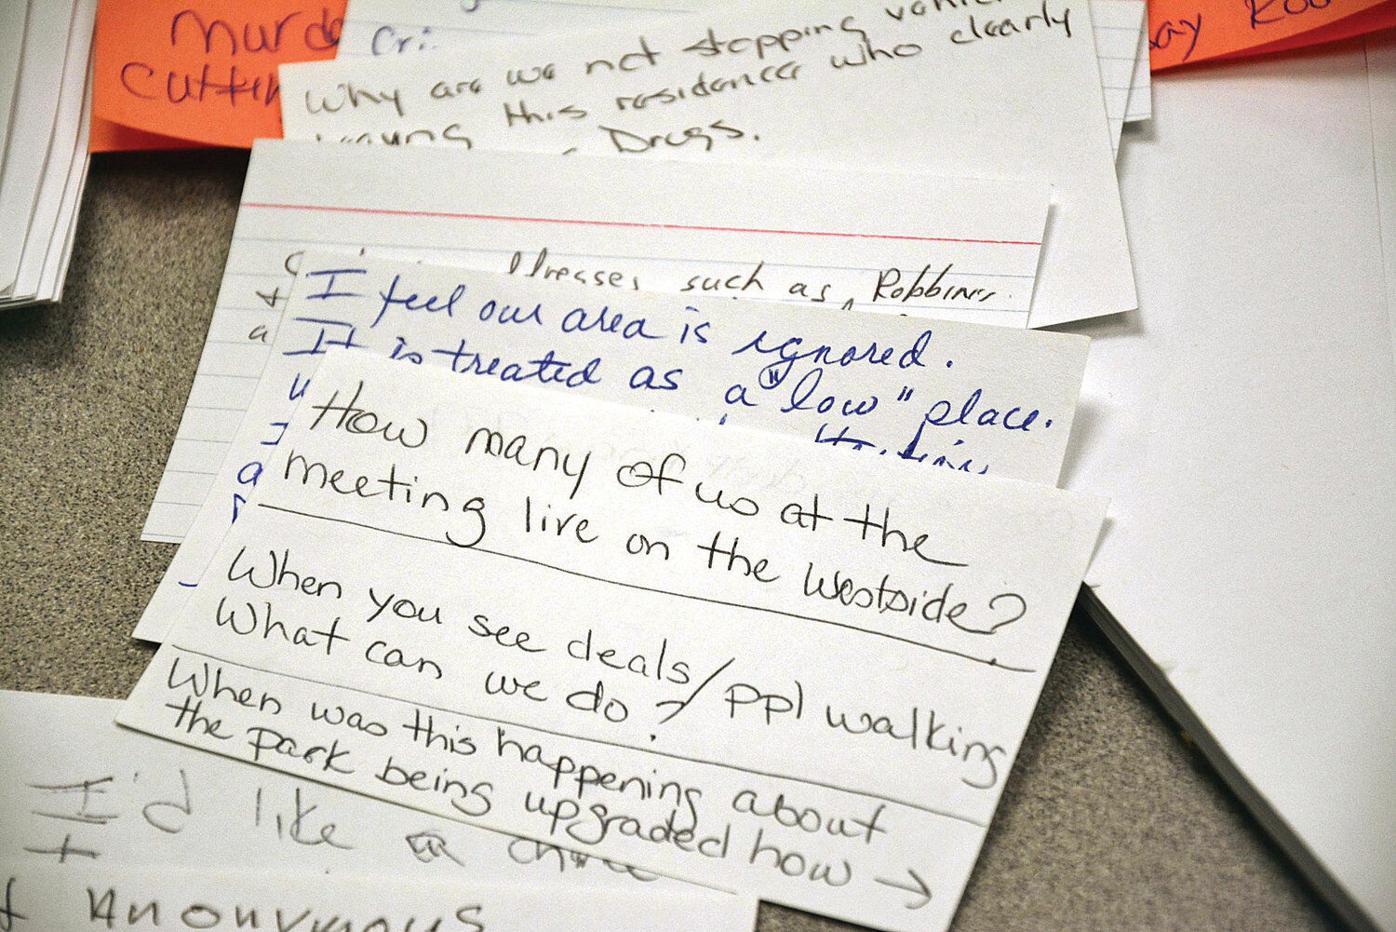 In Pittsfield, residents, police seek balance in keeping neighborhoods safe